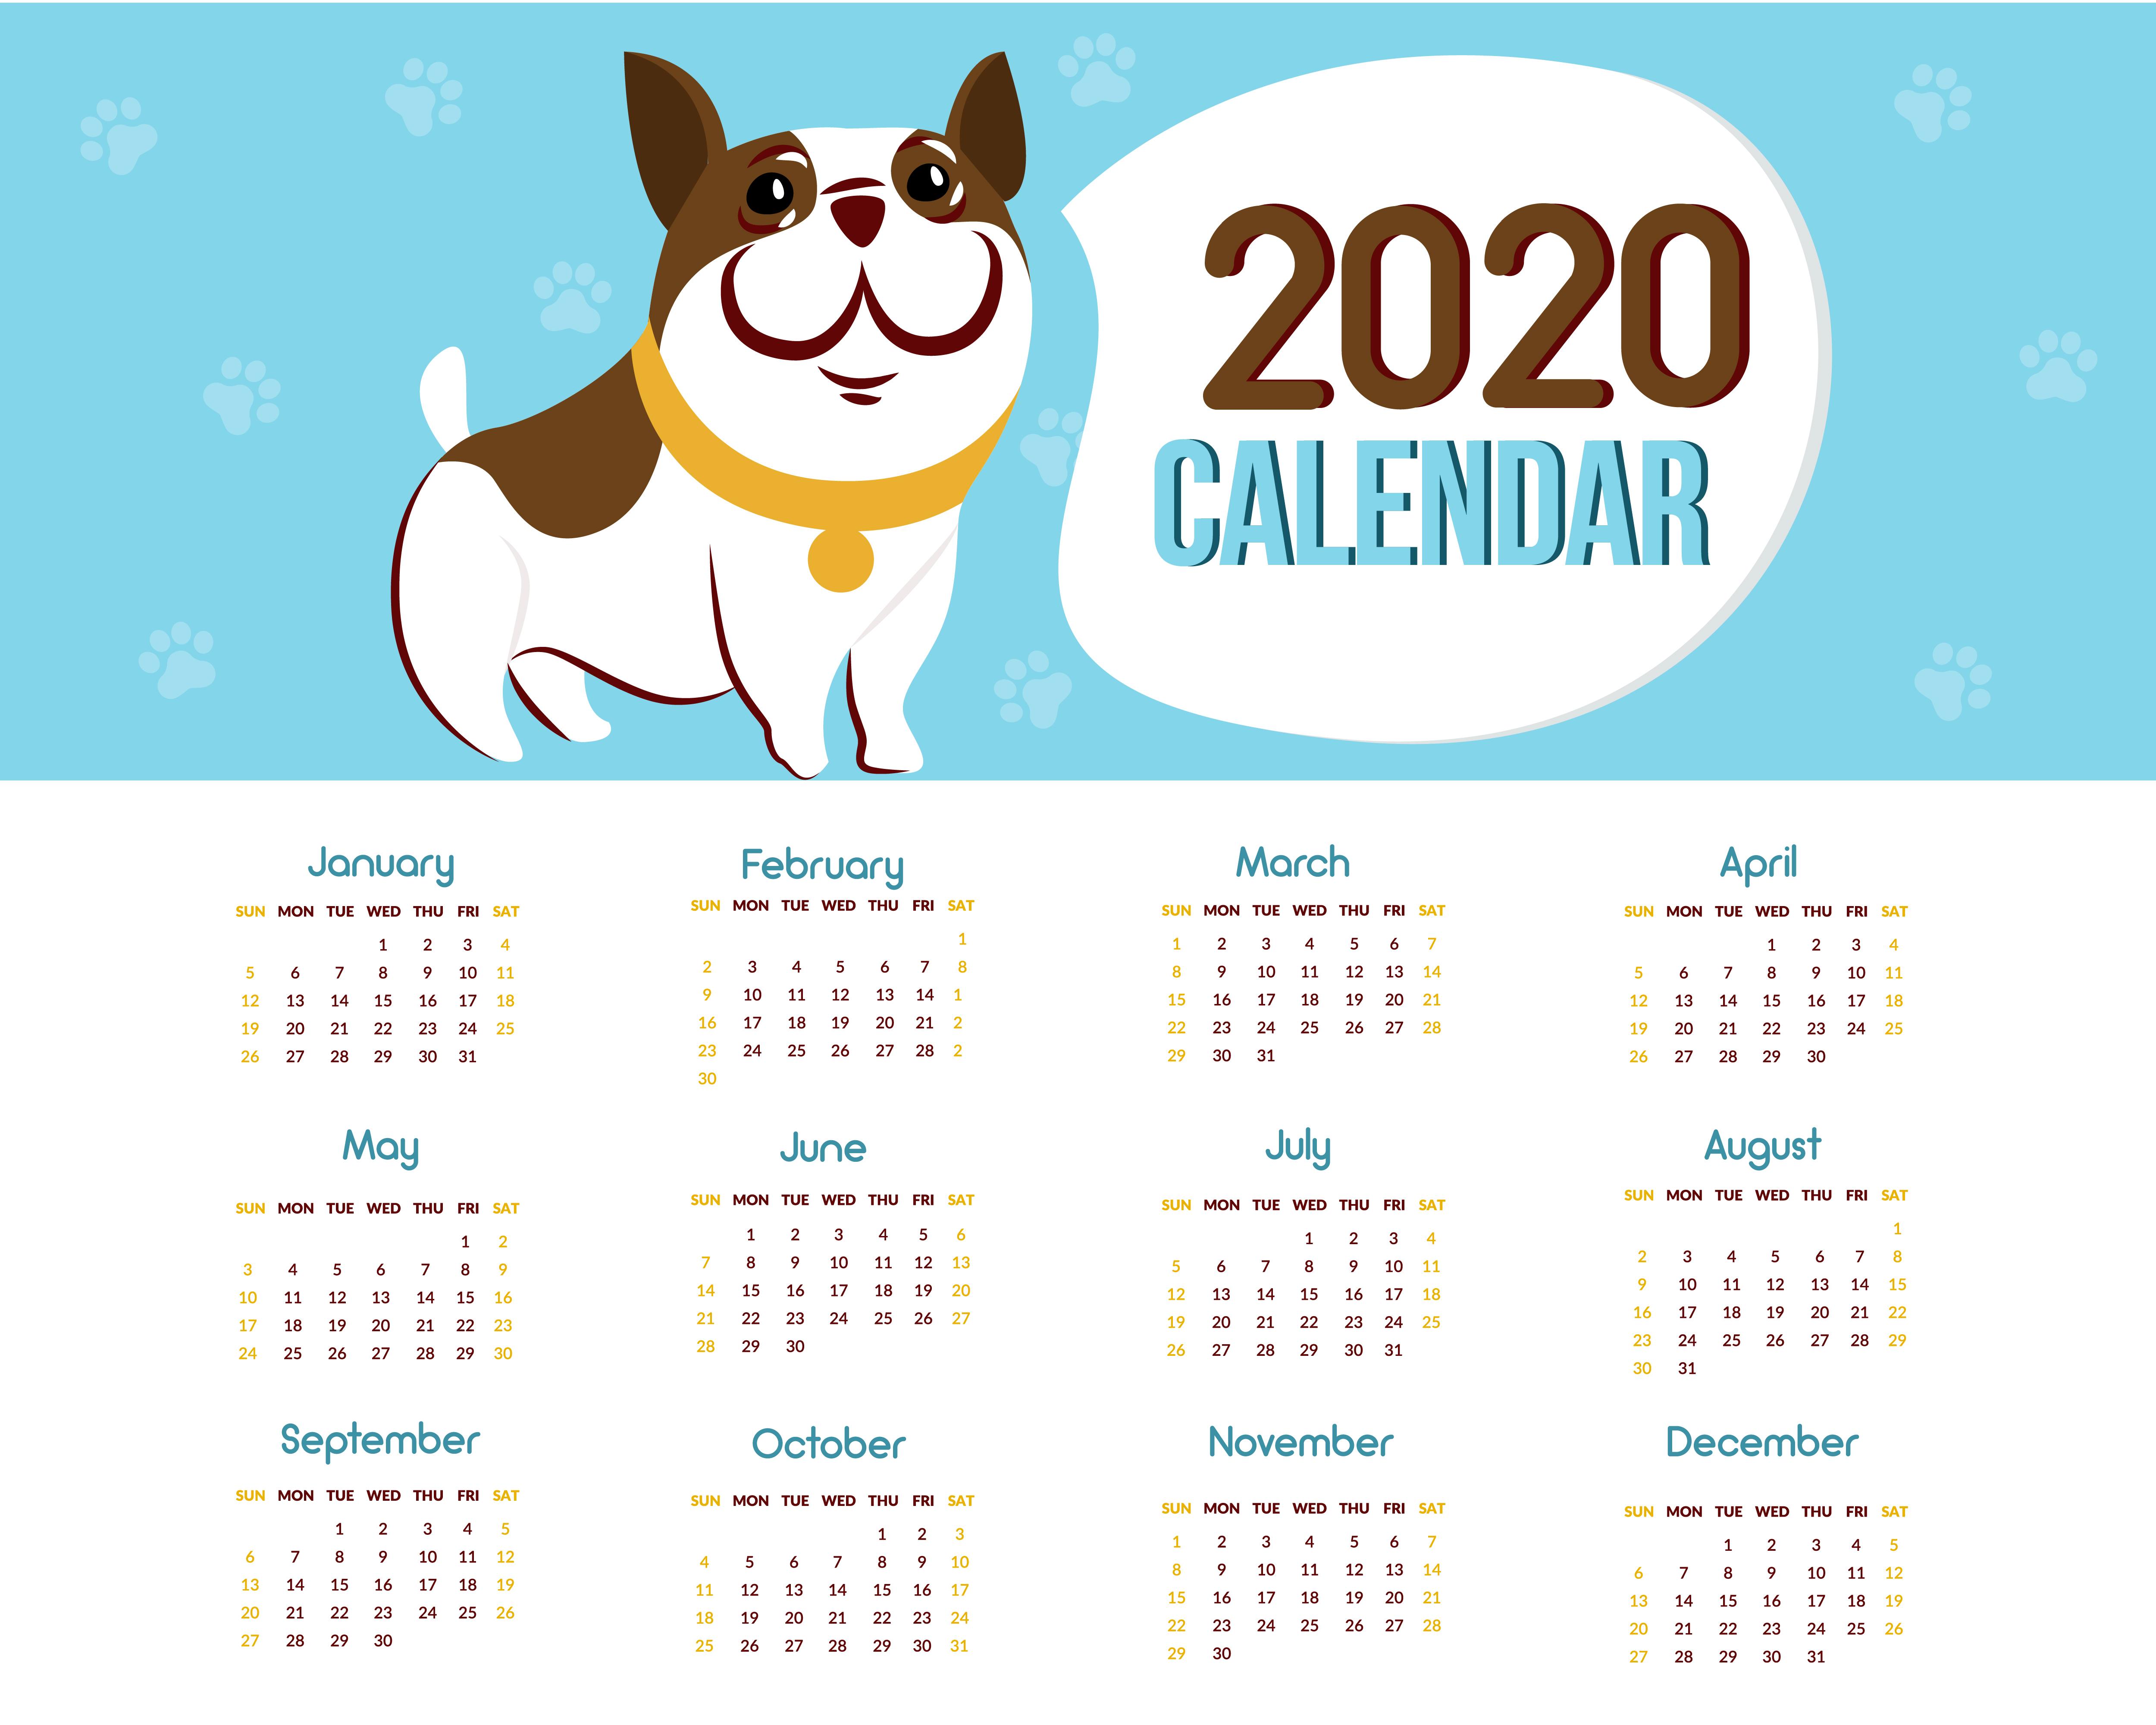 Calendario 2020 Vettoriale Gratis.Calendar 2020 Free Vector Art 124 Free Downloads